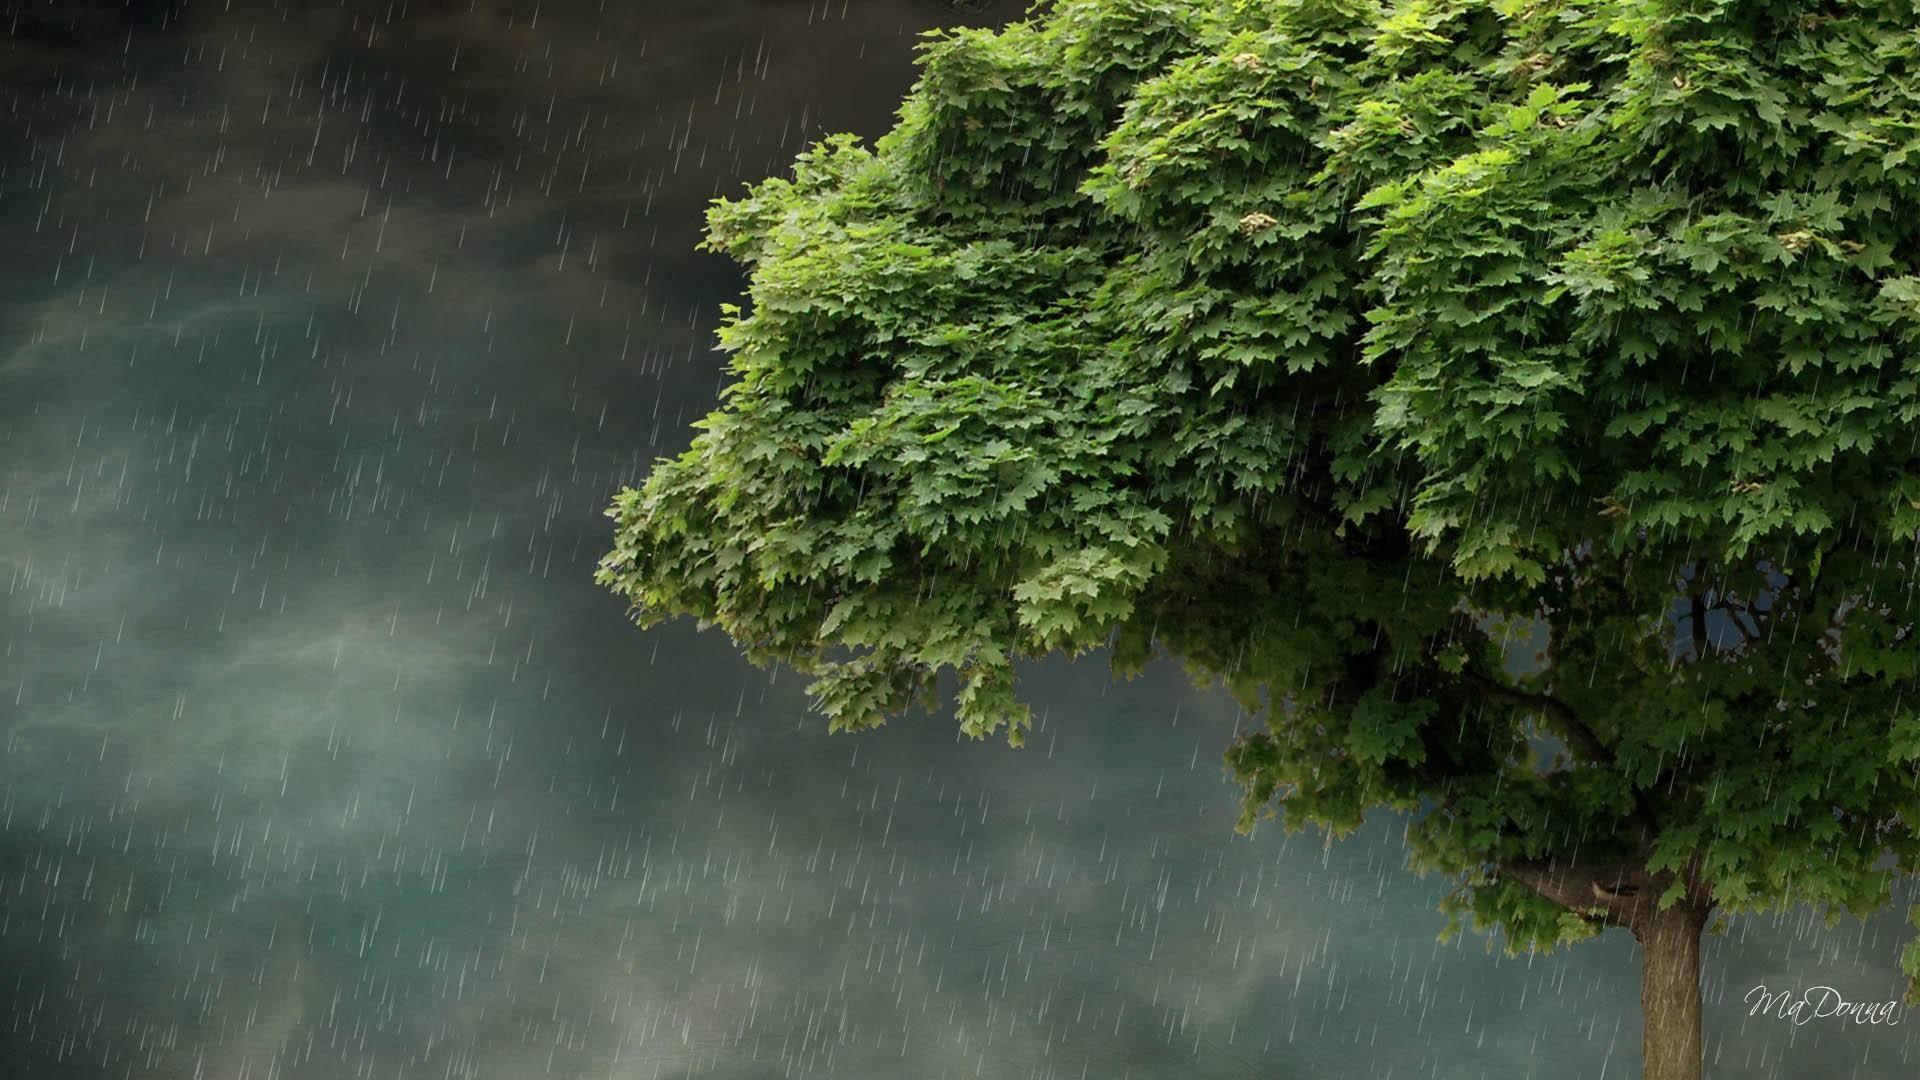 Beautiful Rainy Season On Grass Wallpaper Hd 9310 Wallpaper Sound Meditation Rain Music Relaxing Music